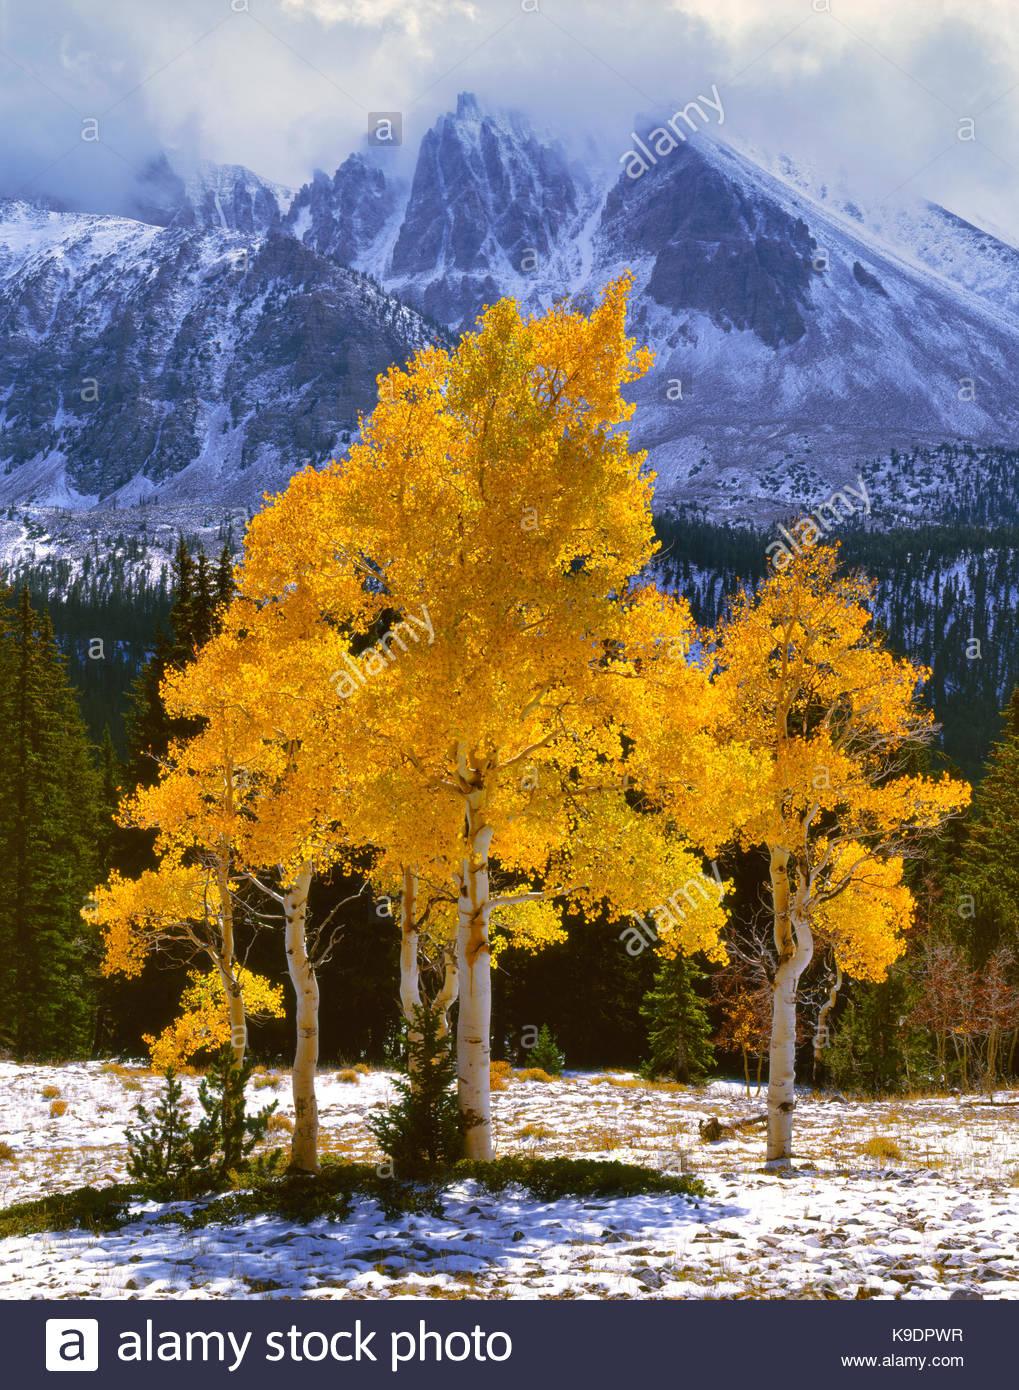 Aspens below Jeff Davis Peak, Great Basin National Park, Nevada - Stock Image